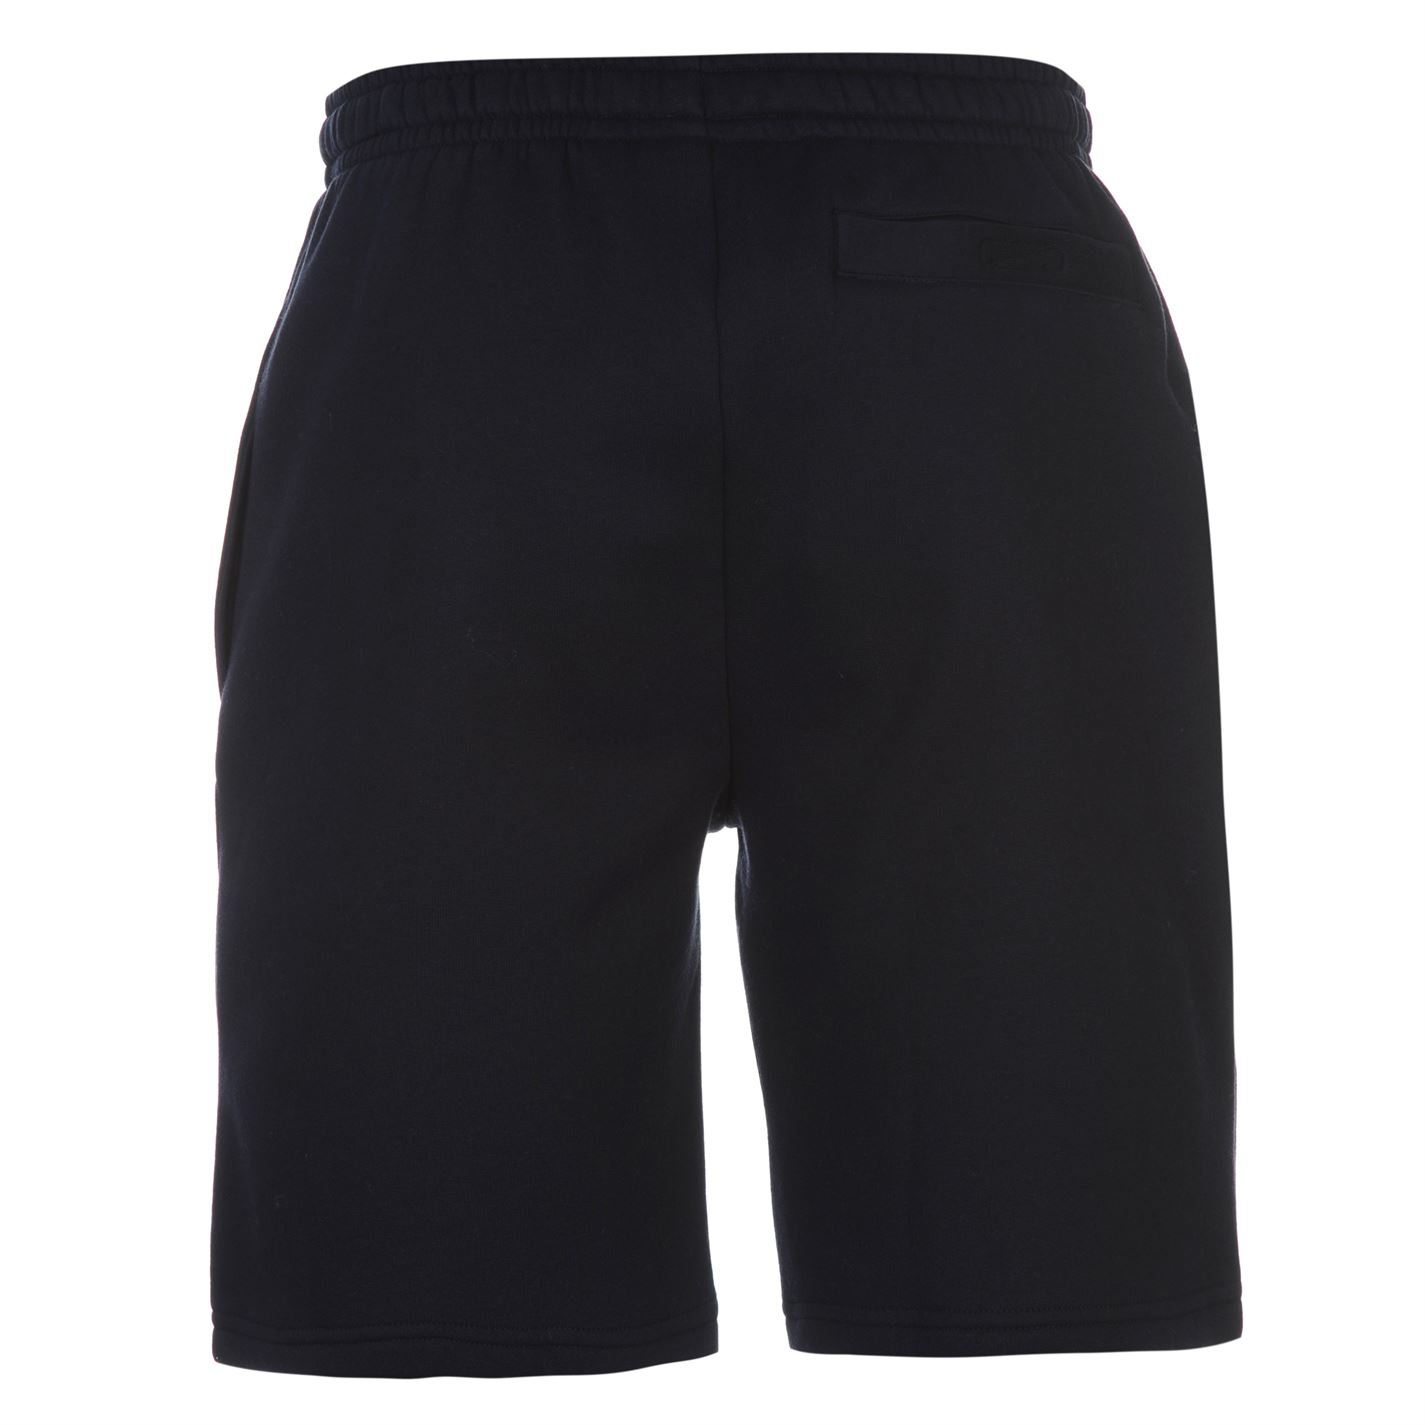 Lacoste-Fleece-Jogger-Shorts-Mens thumbnail 13